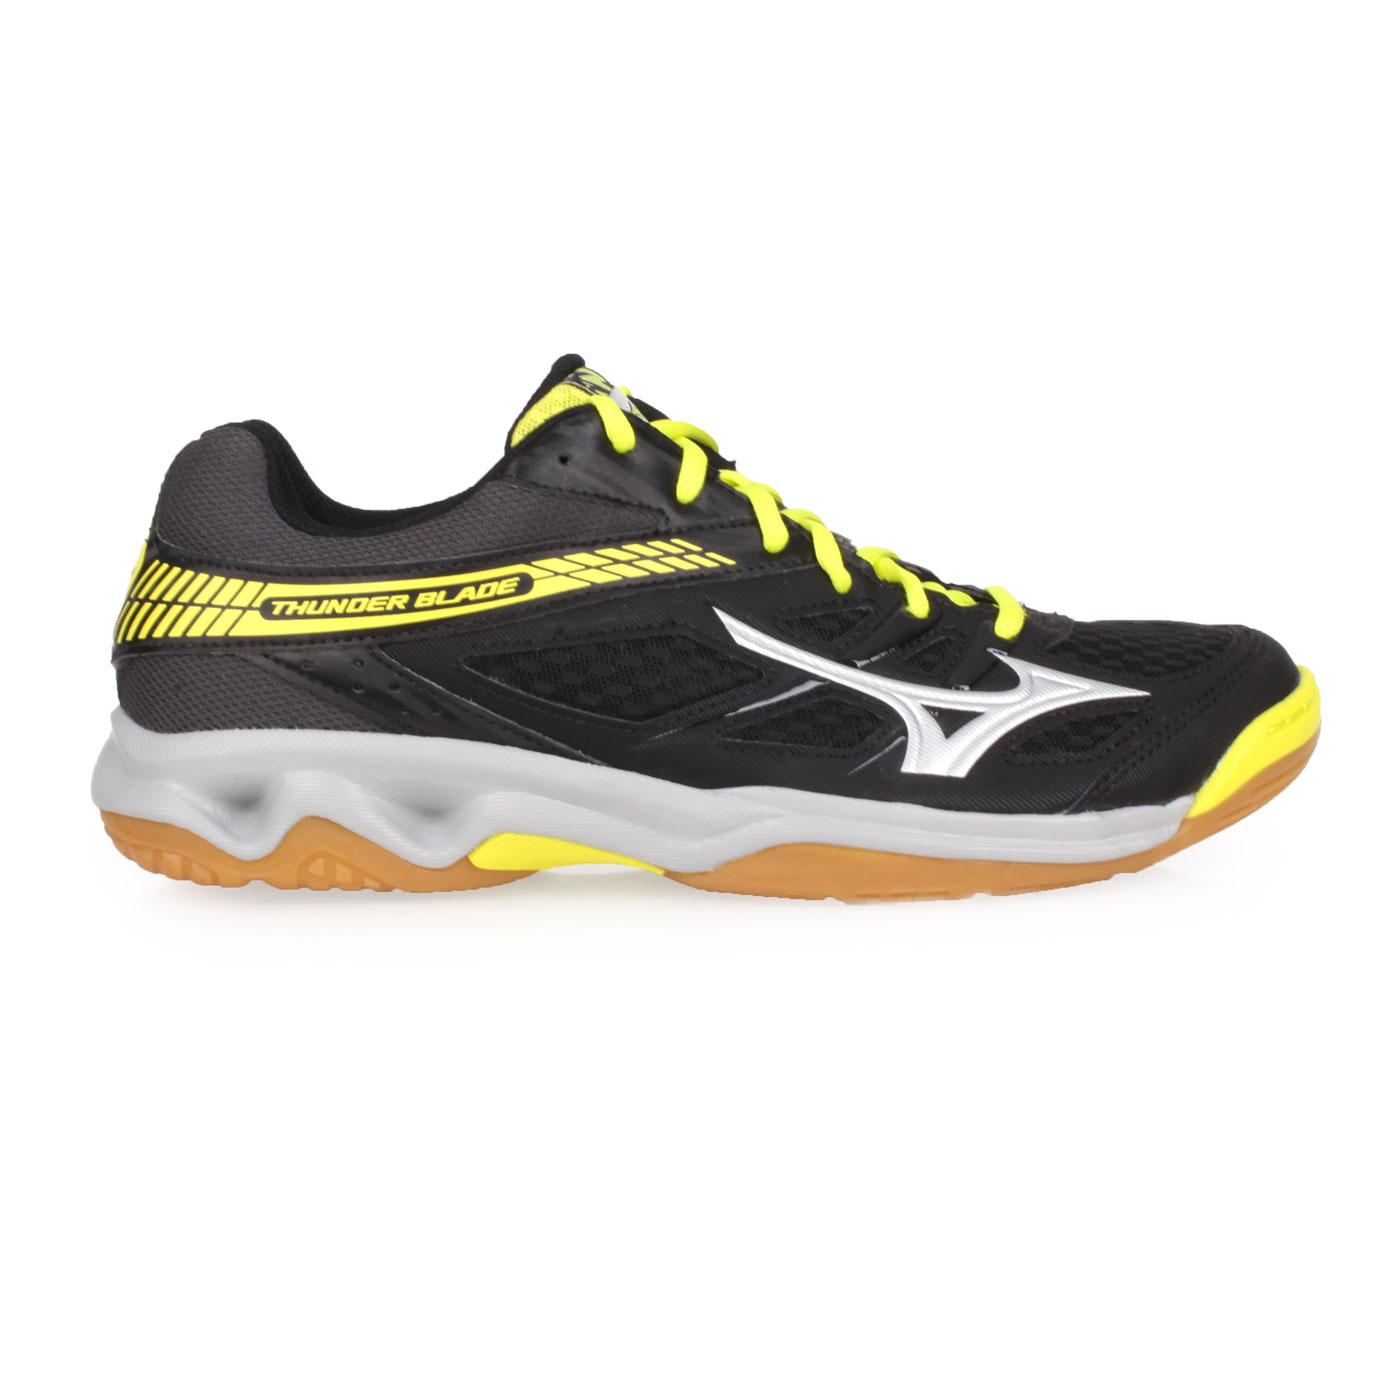 MIZUNO 排球鞋  @THUDNER BLADE@V1GA177005 - 黑黑銀黃